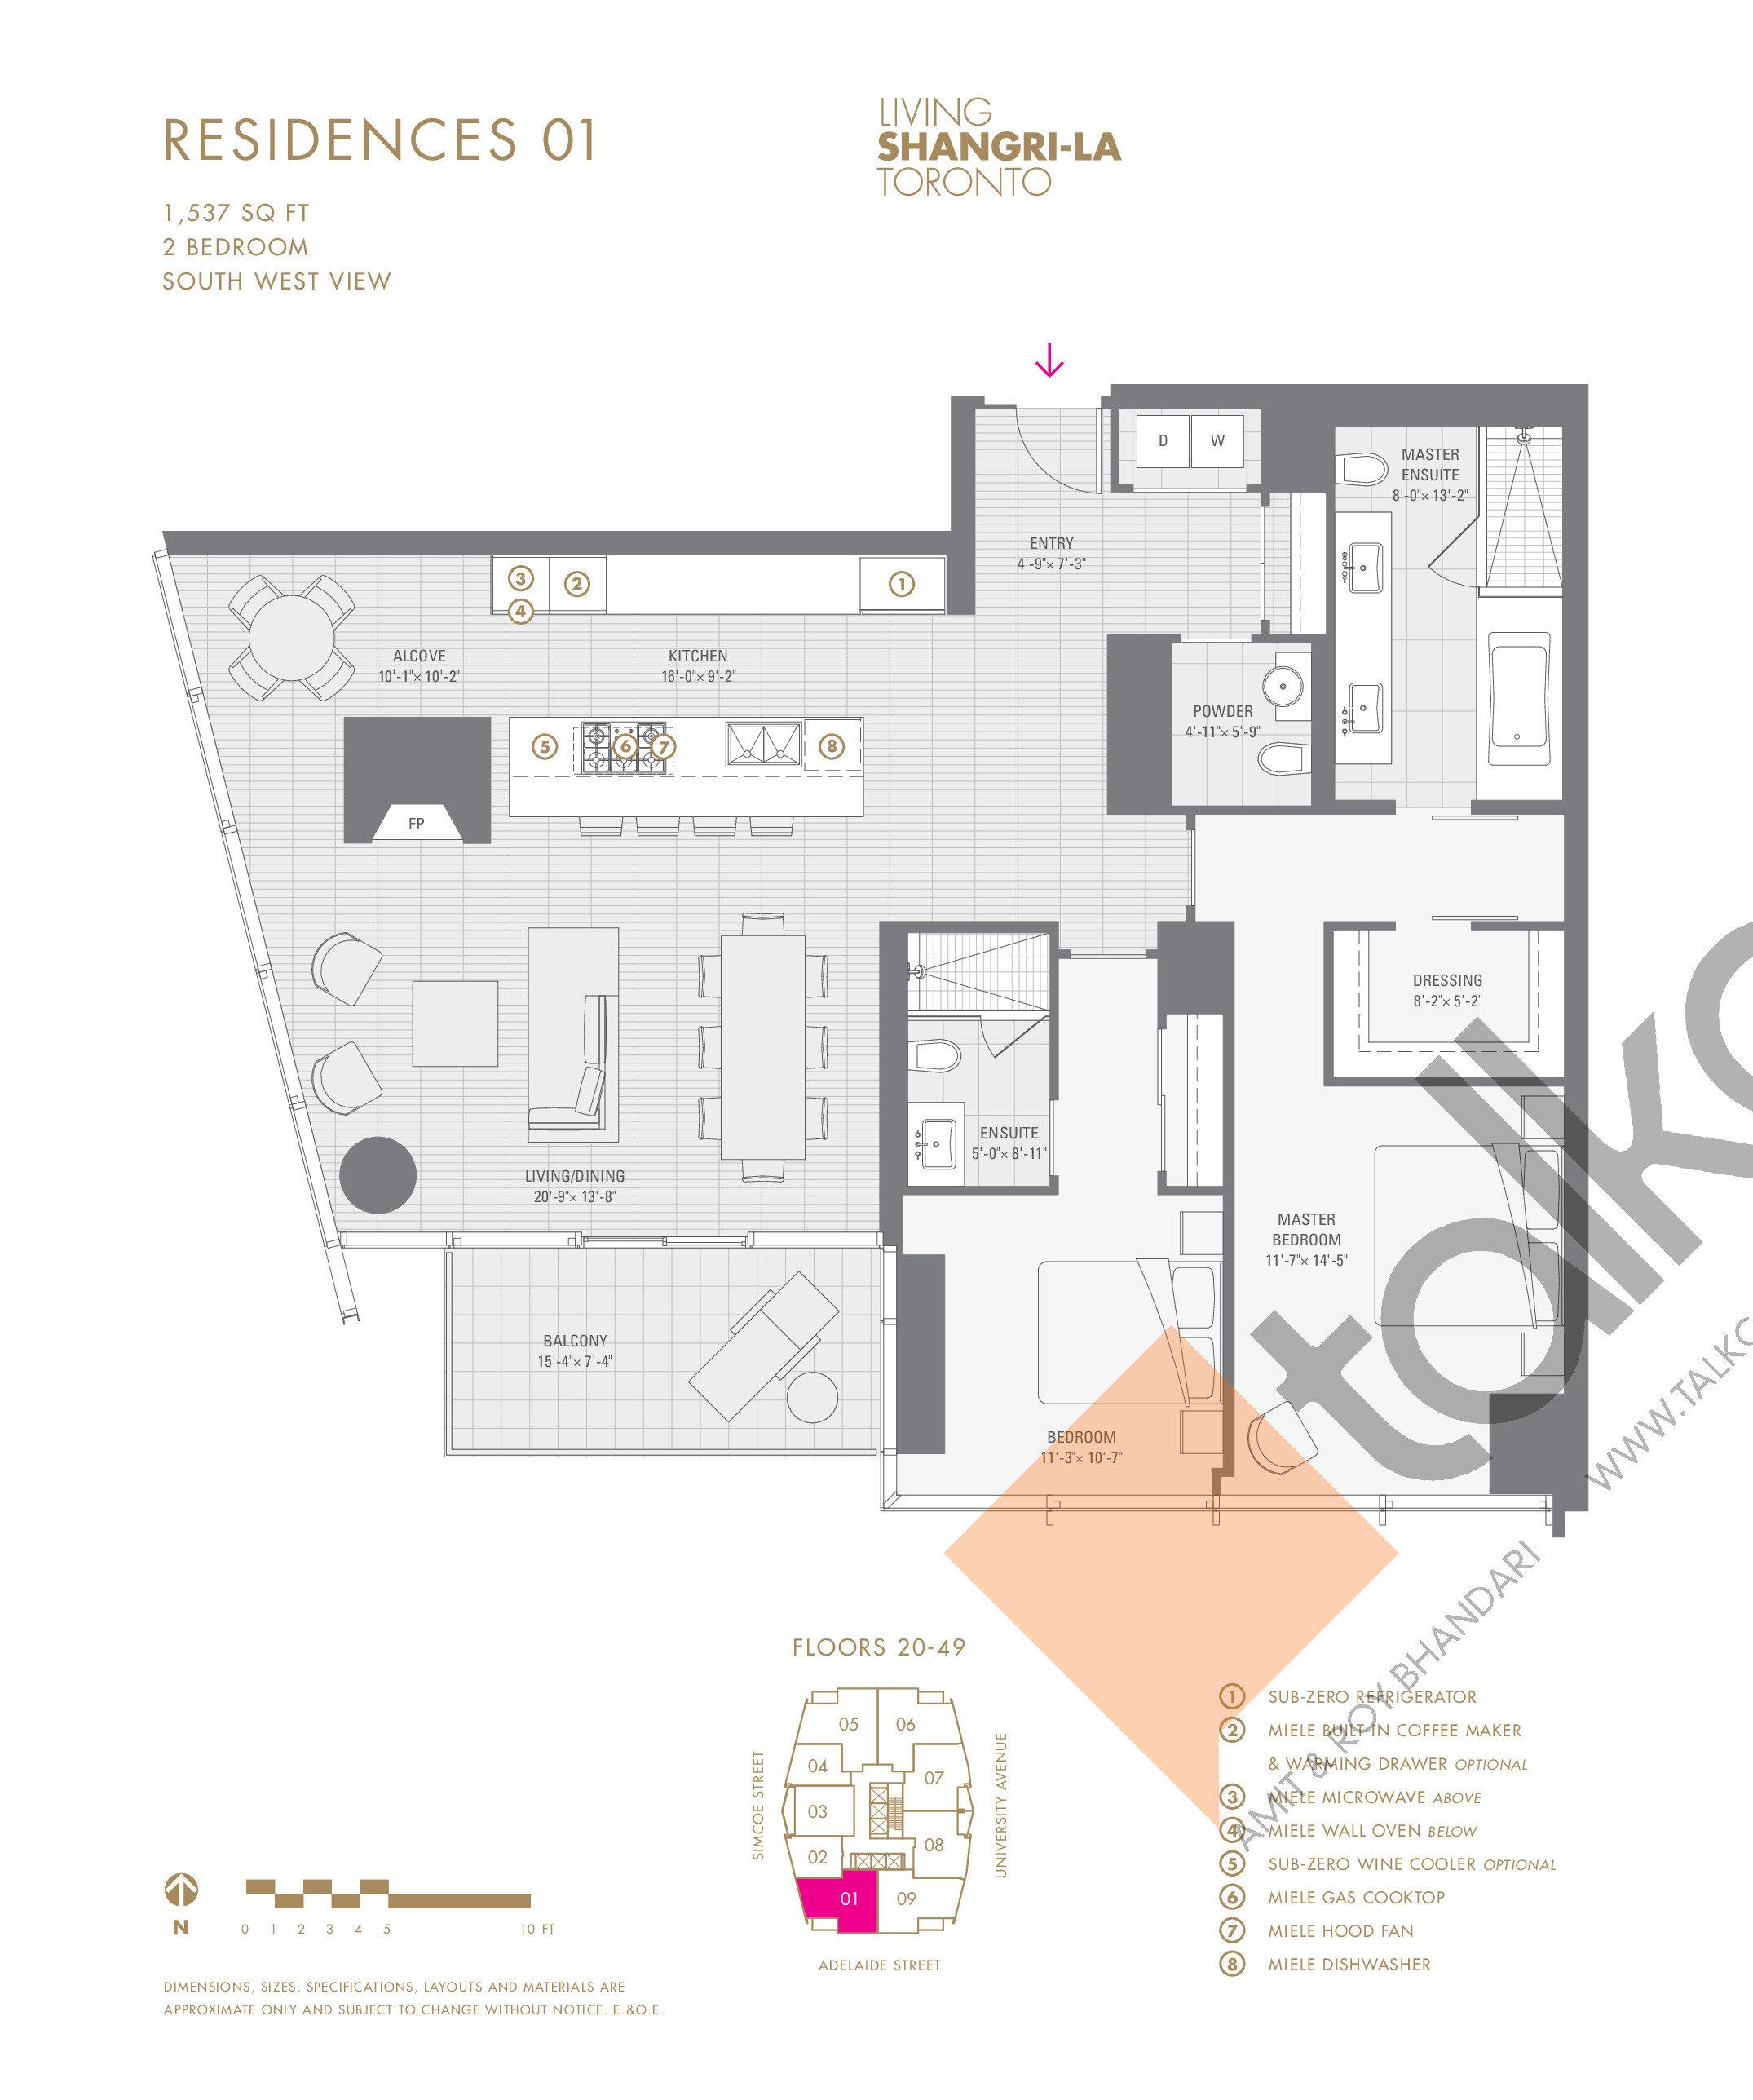 Shangri La Hotel Amp Residences Floor Plans Prices